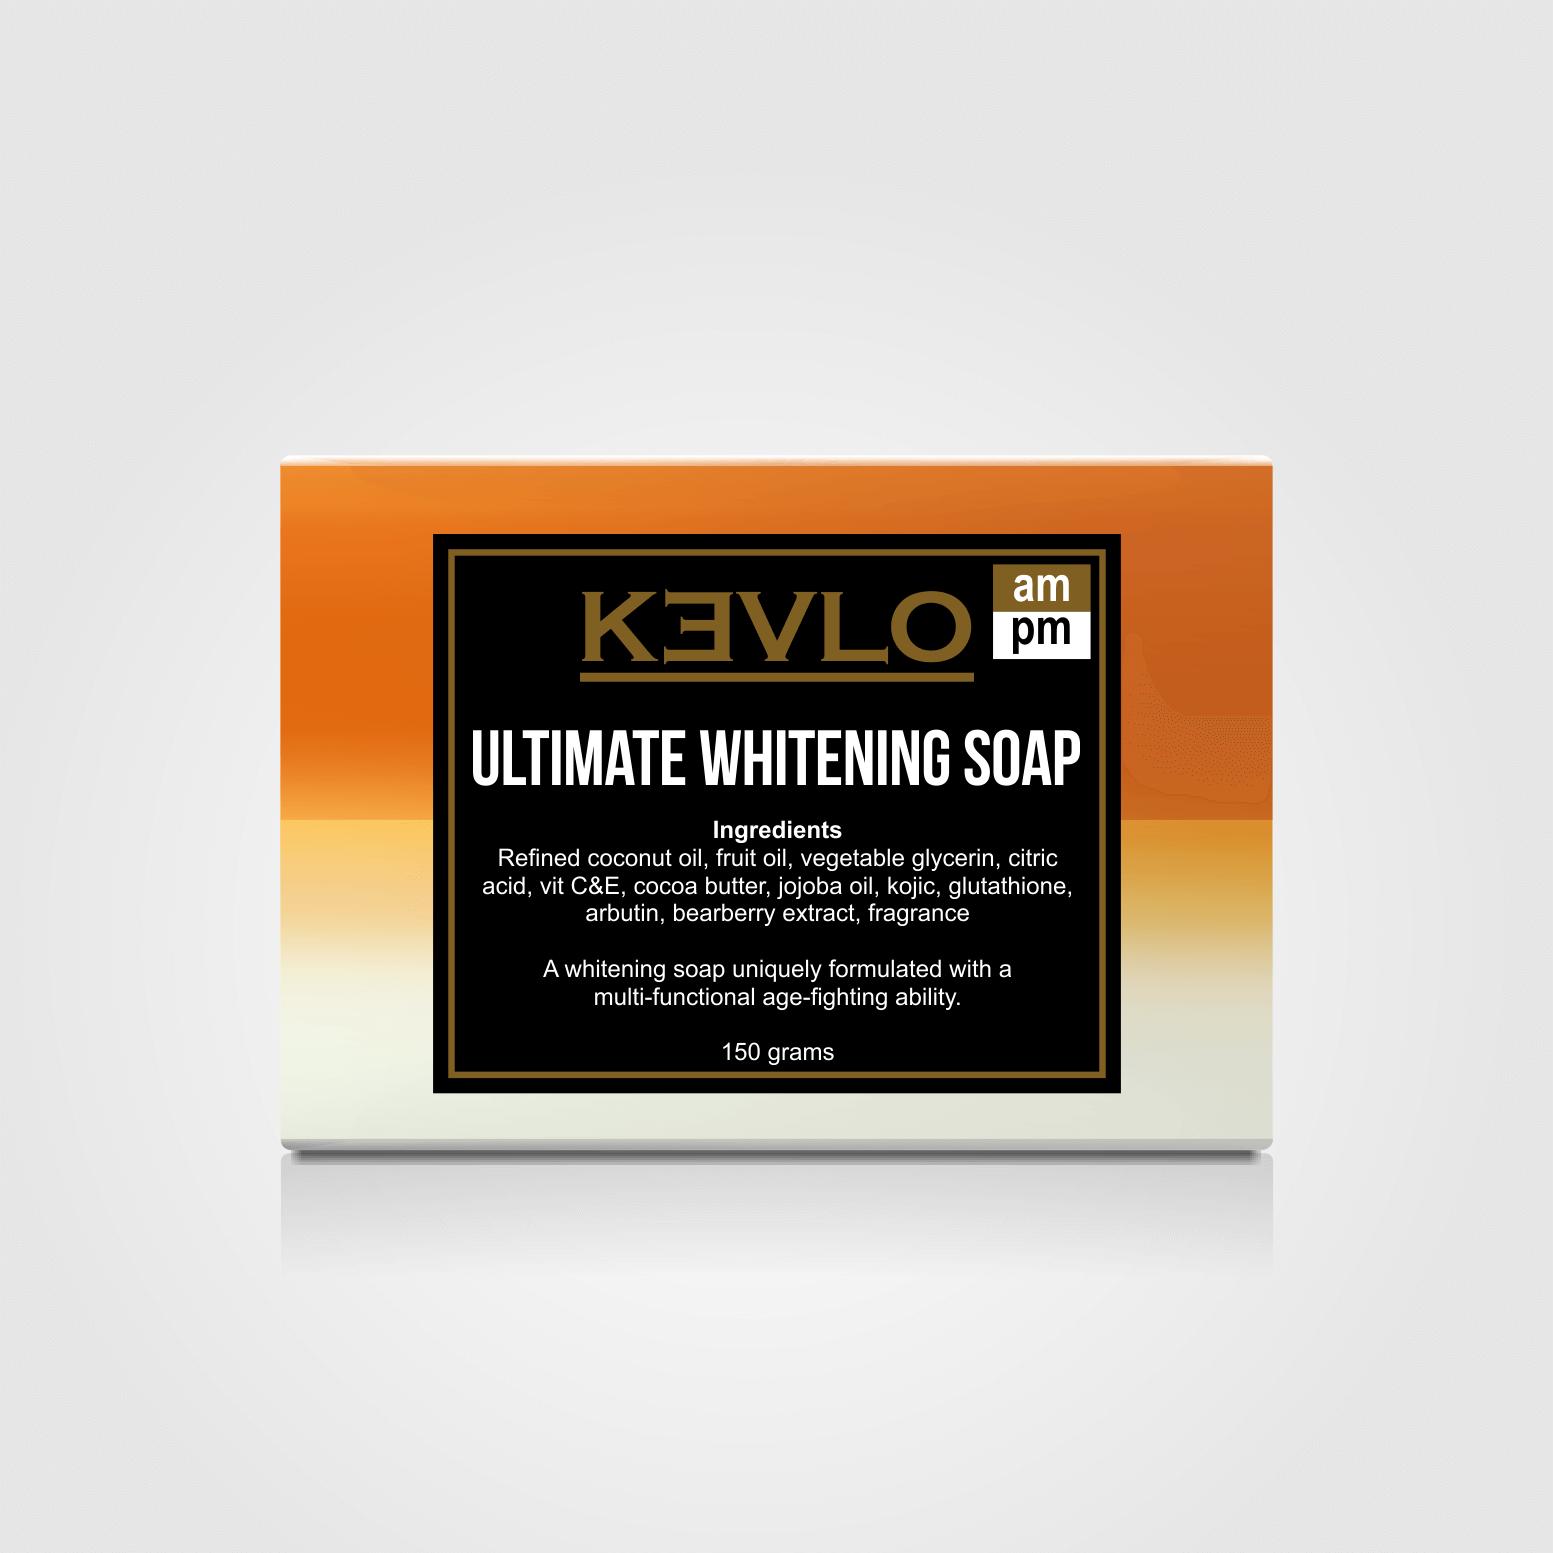 KEVLO Ultimate Whitening Soap